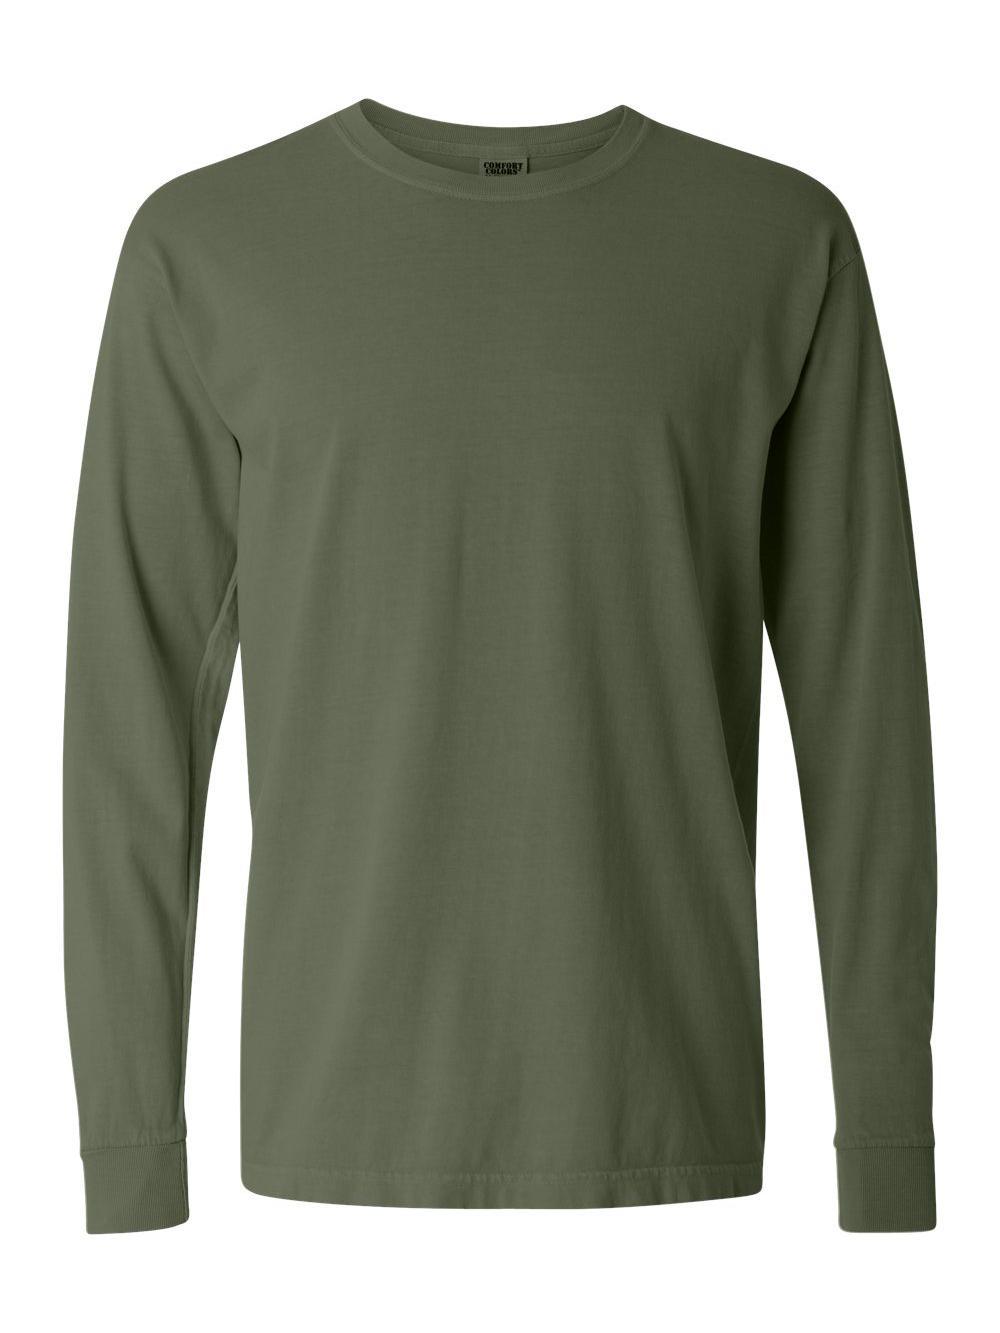 Comfort-Colors-Garment-Dyed-Heavyweight-Ringspun-Long-Sleeve-T-Shirt-6014 thumbnail 39